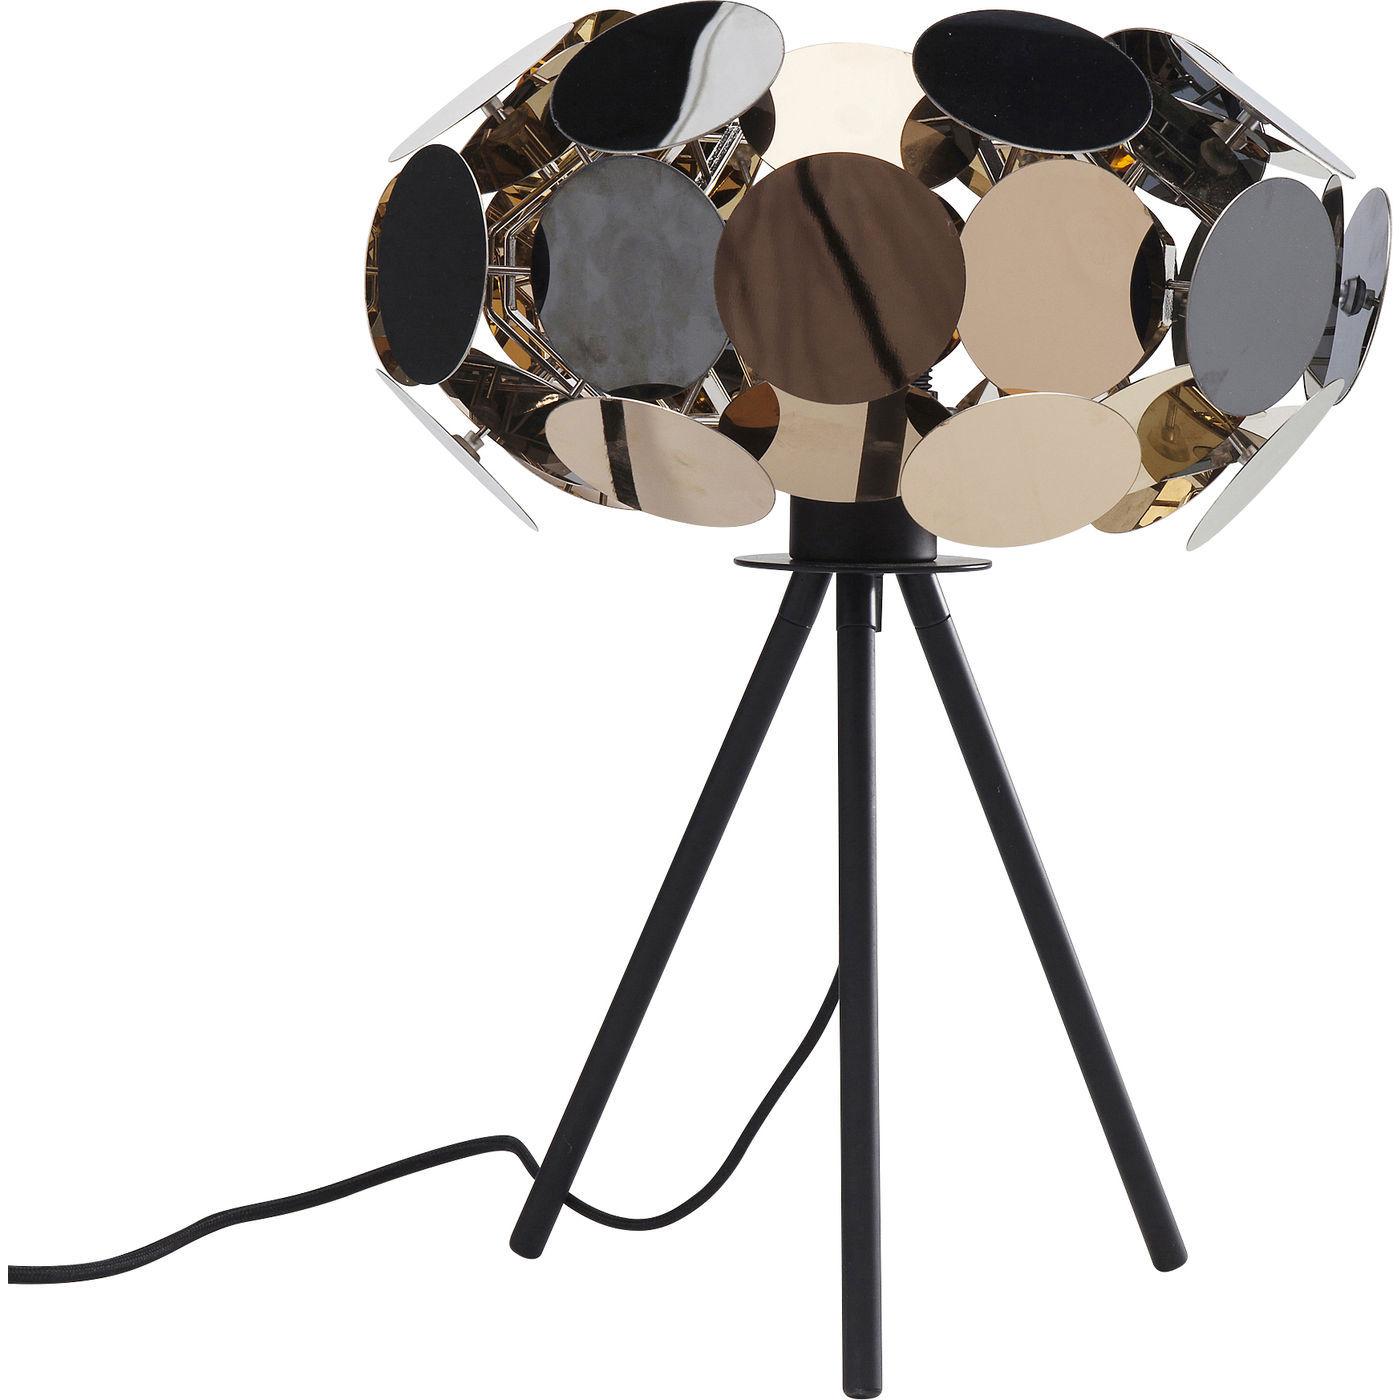 Image of   KARE DESIGN City Nights Circles bordlampe - guld/sølv/bronze/sort stål